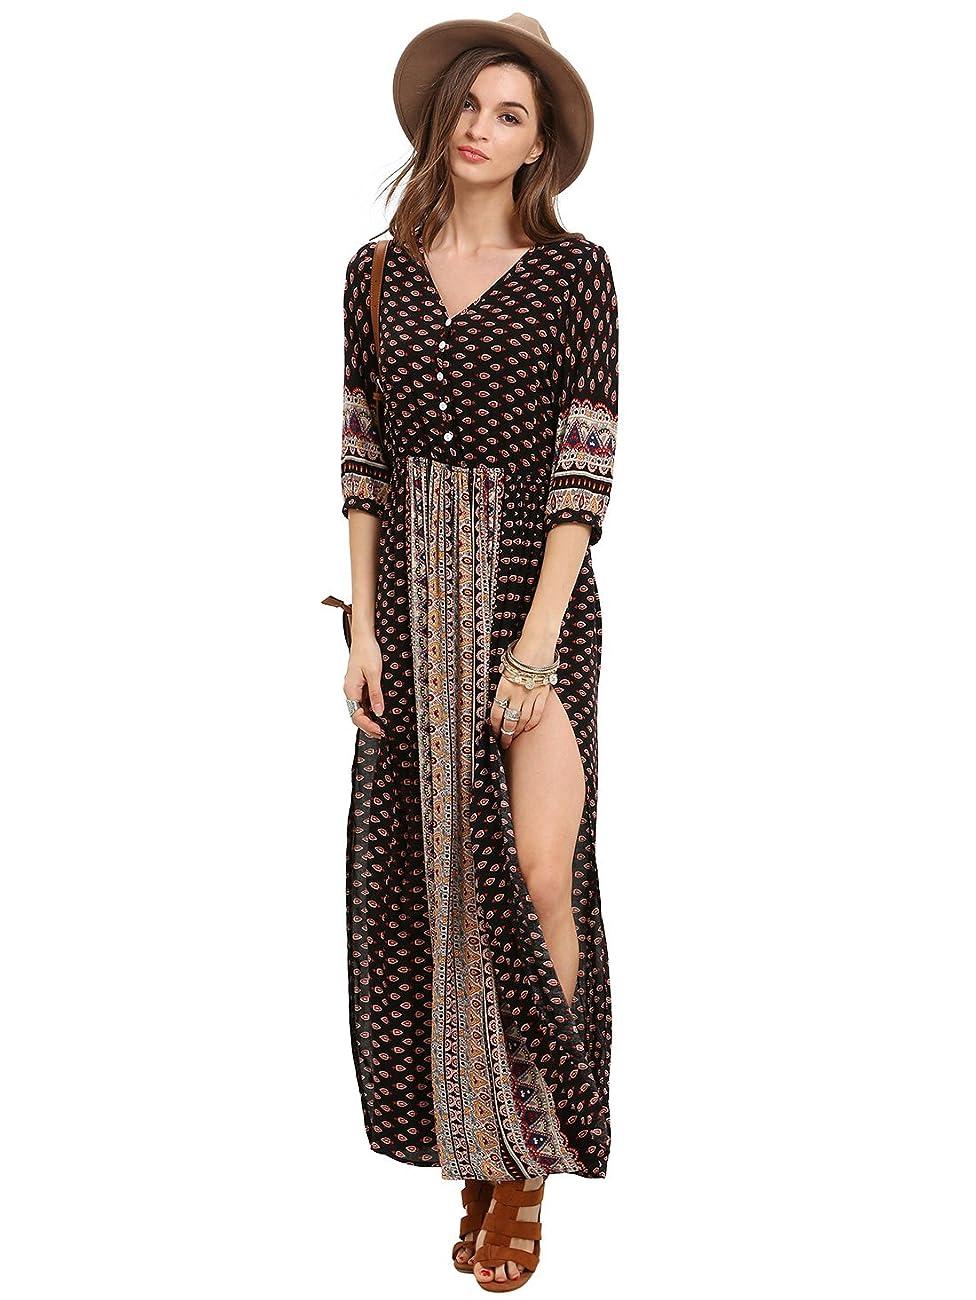 ROMWE Women's Summer Casual Half Sleeve Vintage Print Split Maxi Dress 1